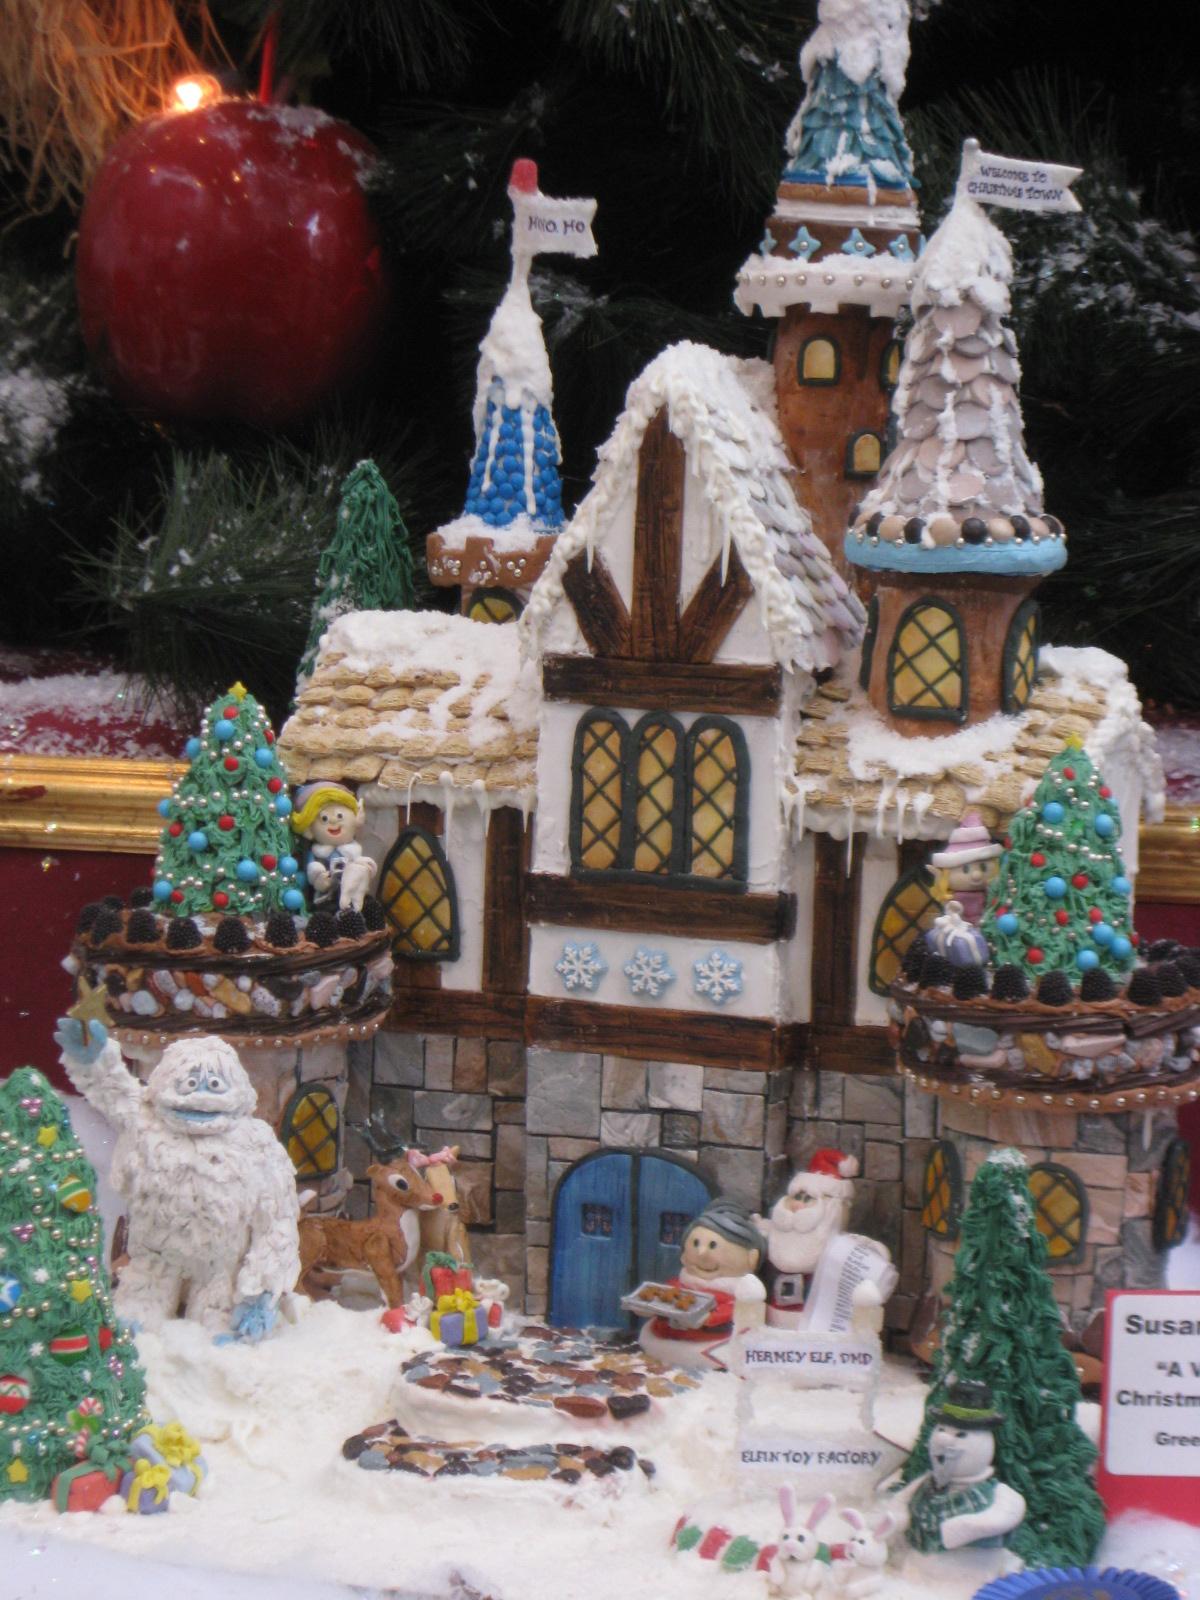 Splendor in the Home: Christmas Moments